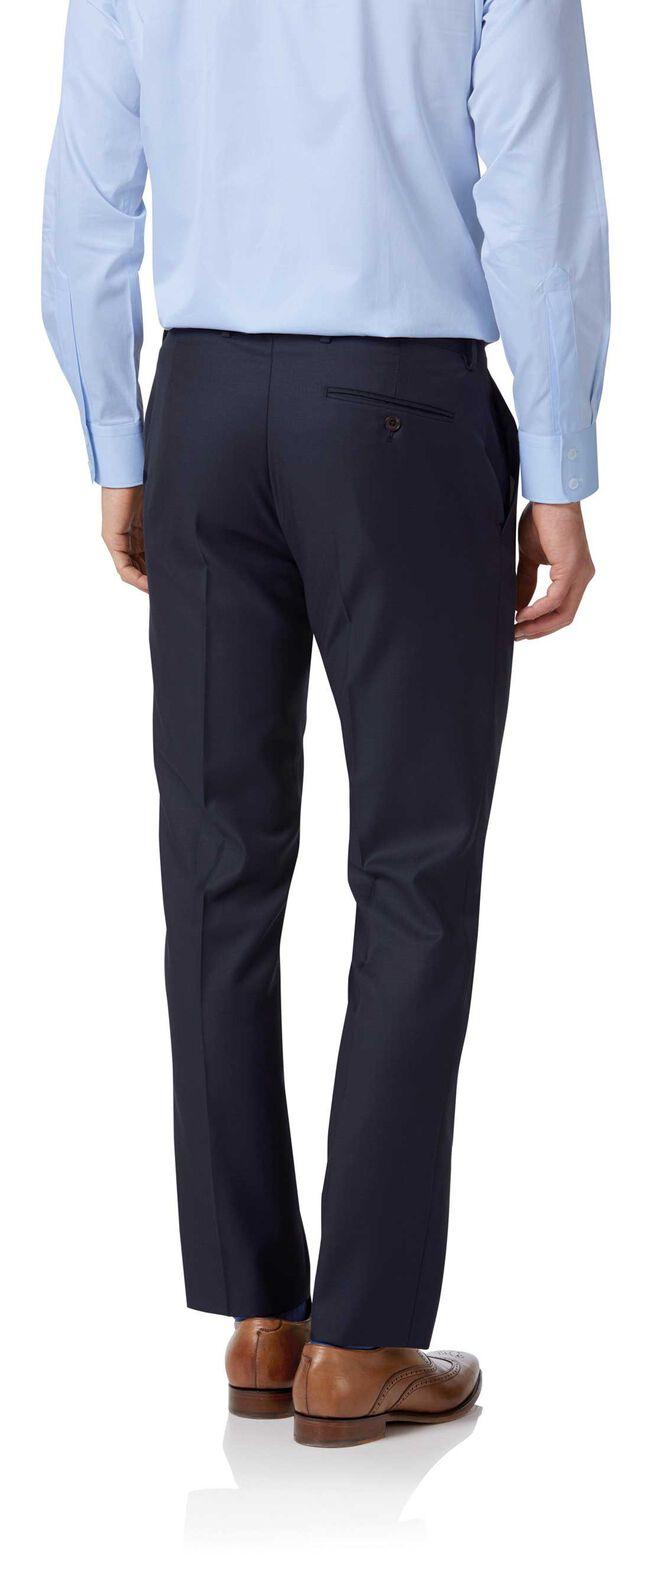 Navy slim fit twill Italian luxury suit